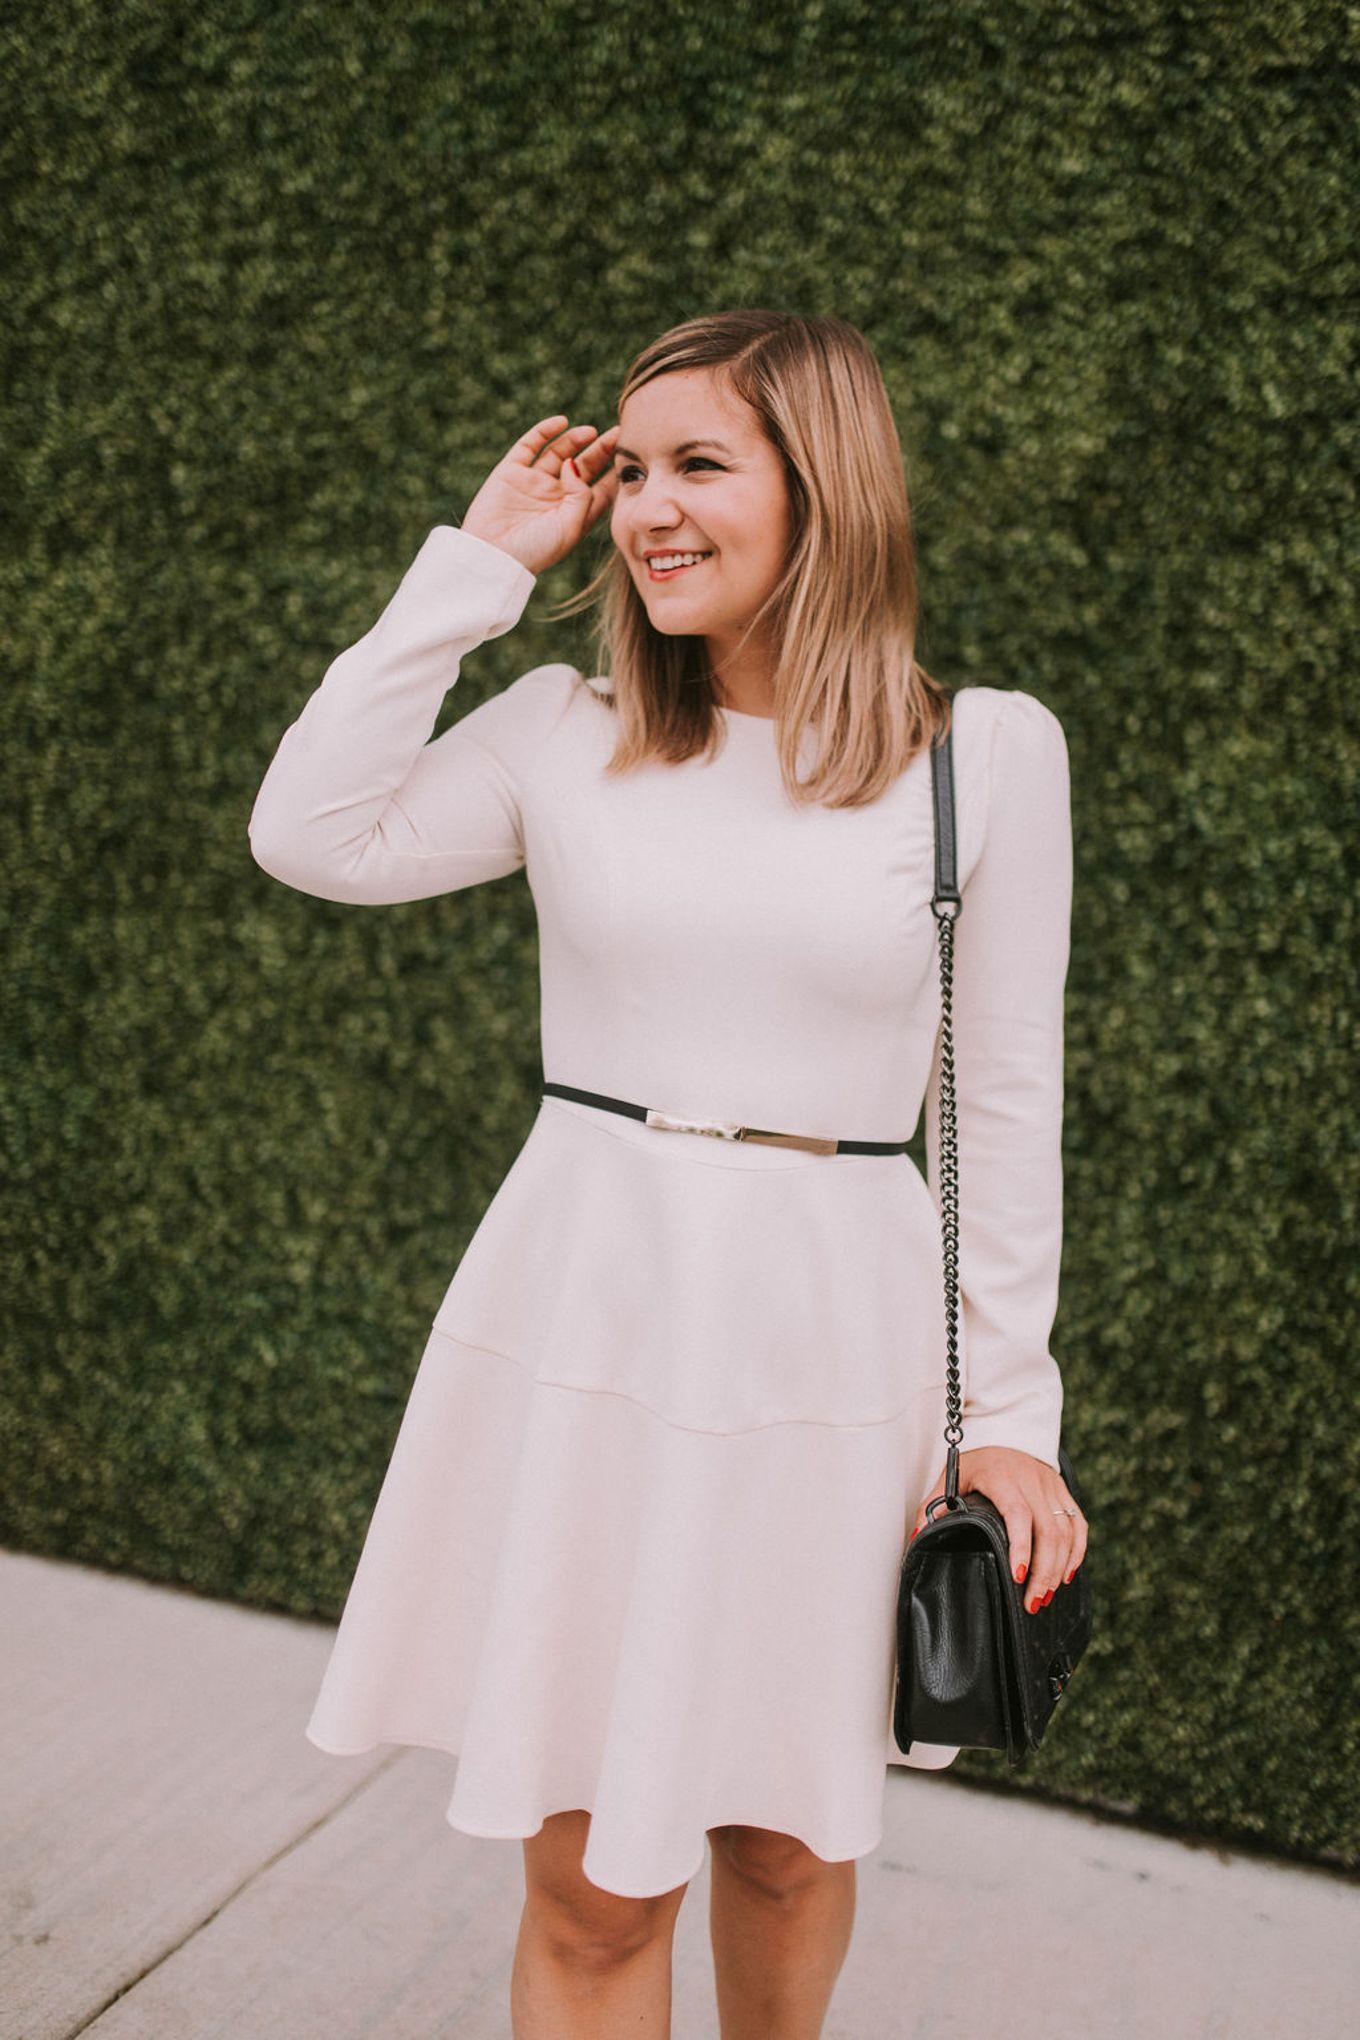 Long Sleeve White Maxi Dress Perfect Temple Dress Or Bridal Shower Dress White Bridal Shower Dress Long Sleeve White Maxi Dress White Long Sleeve Dress [ 1224 x 816 Pixel ]